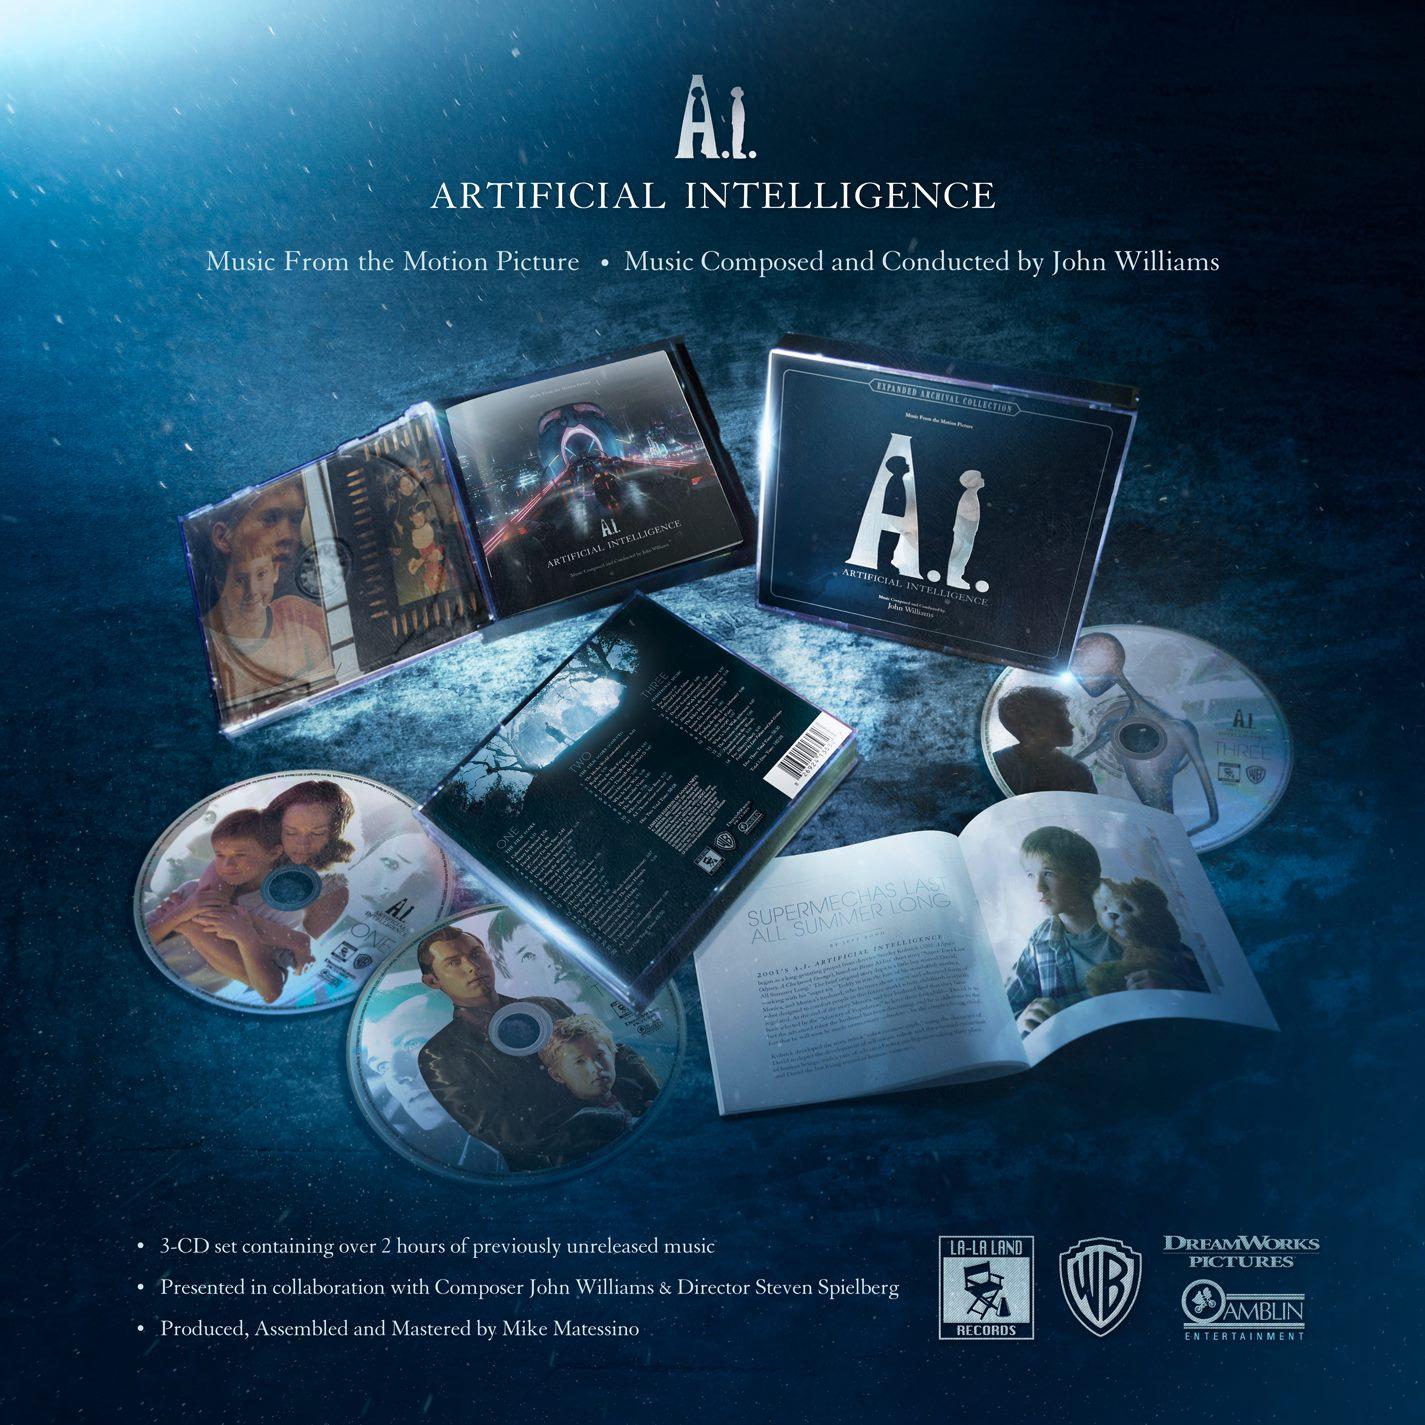 Artificial Intelligence: A I (album)